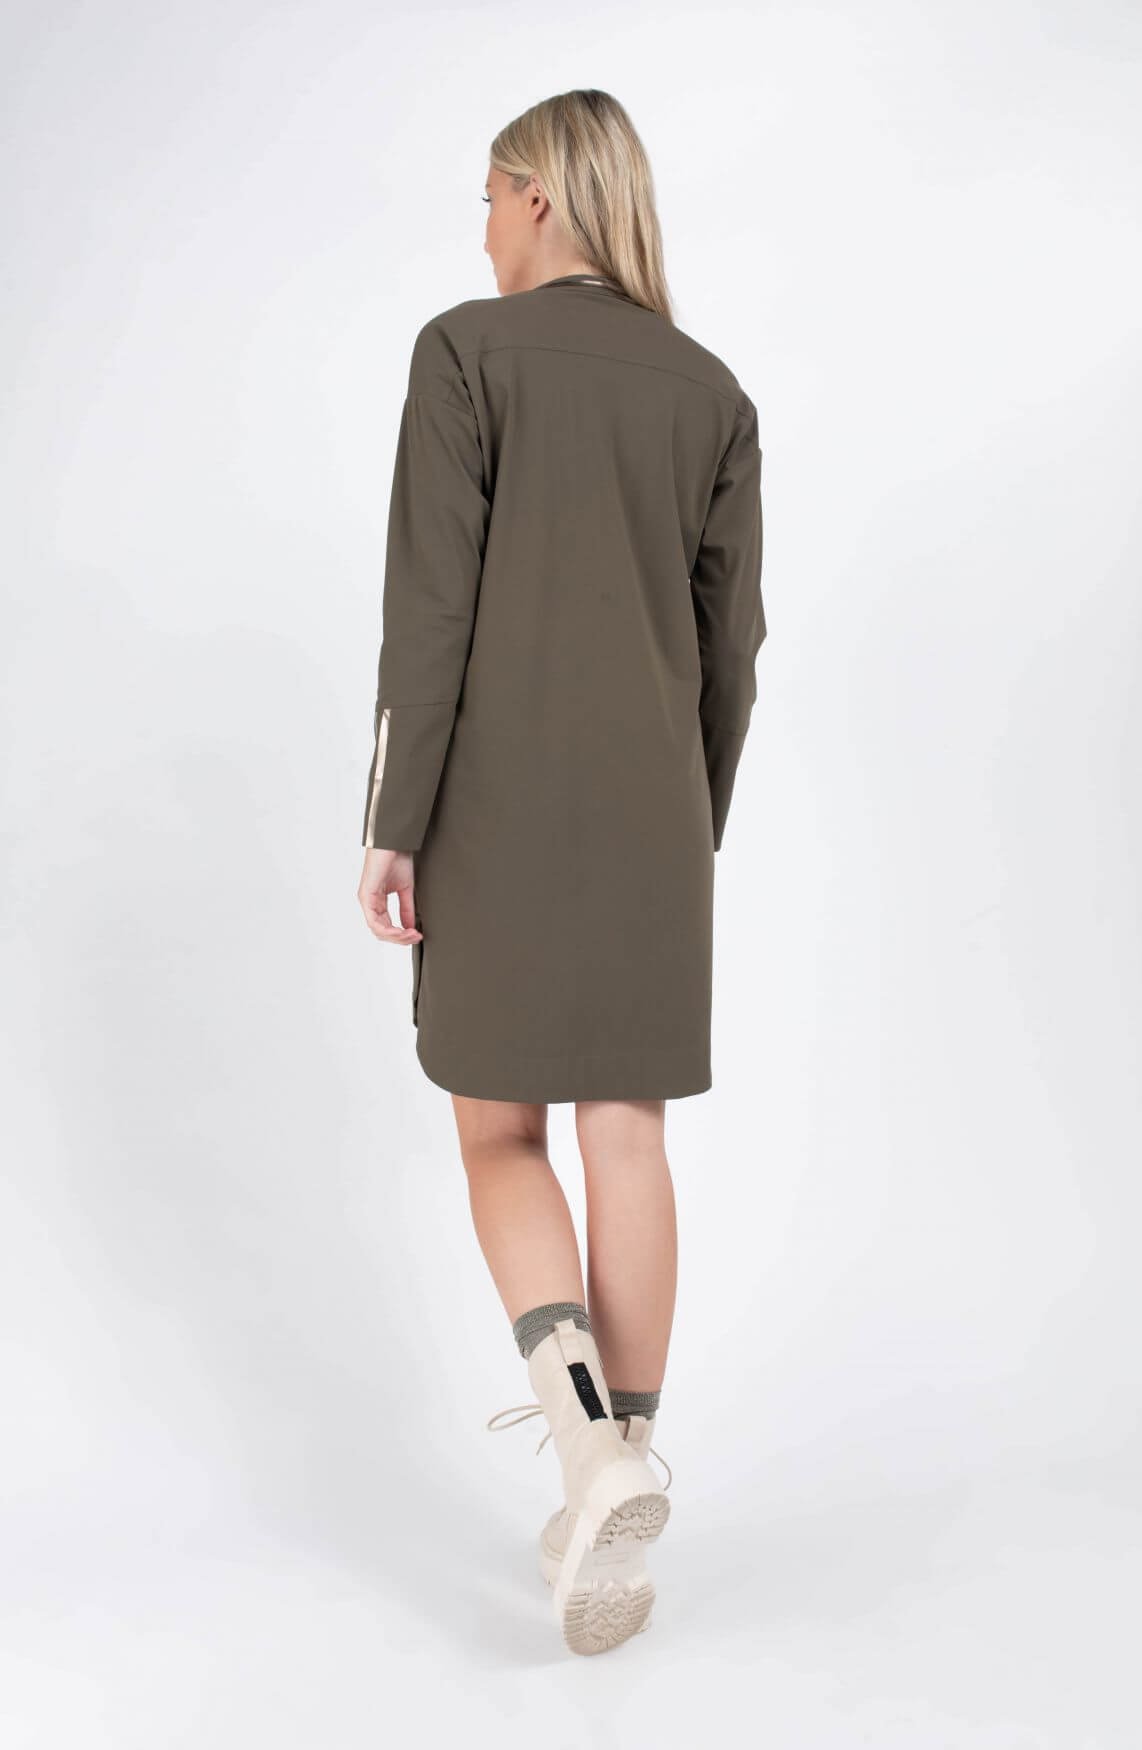 Jane Lushka Dames Amalia jurk Groen